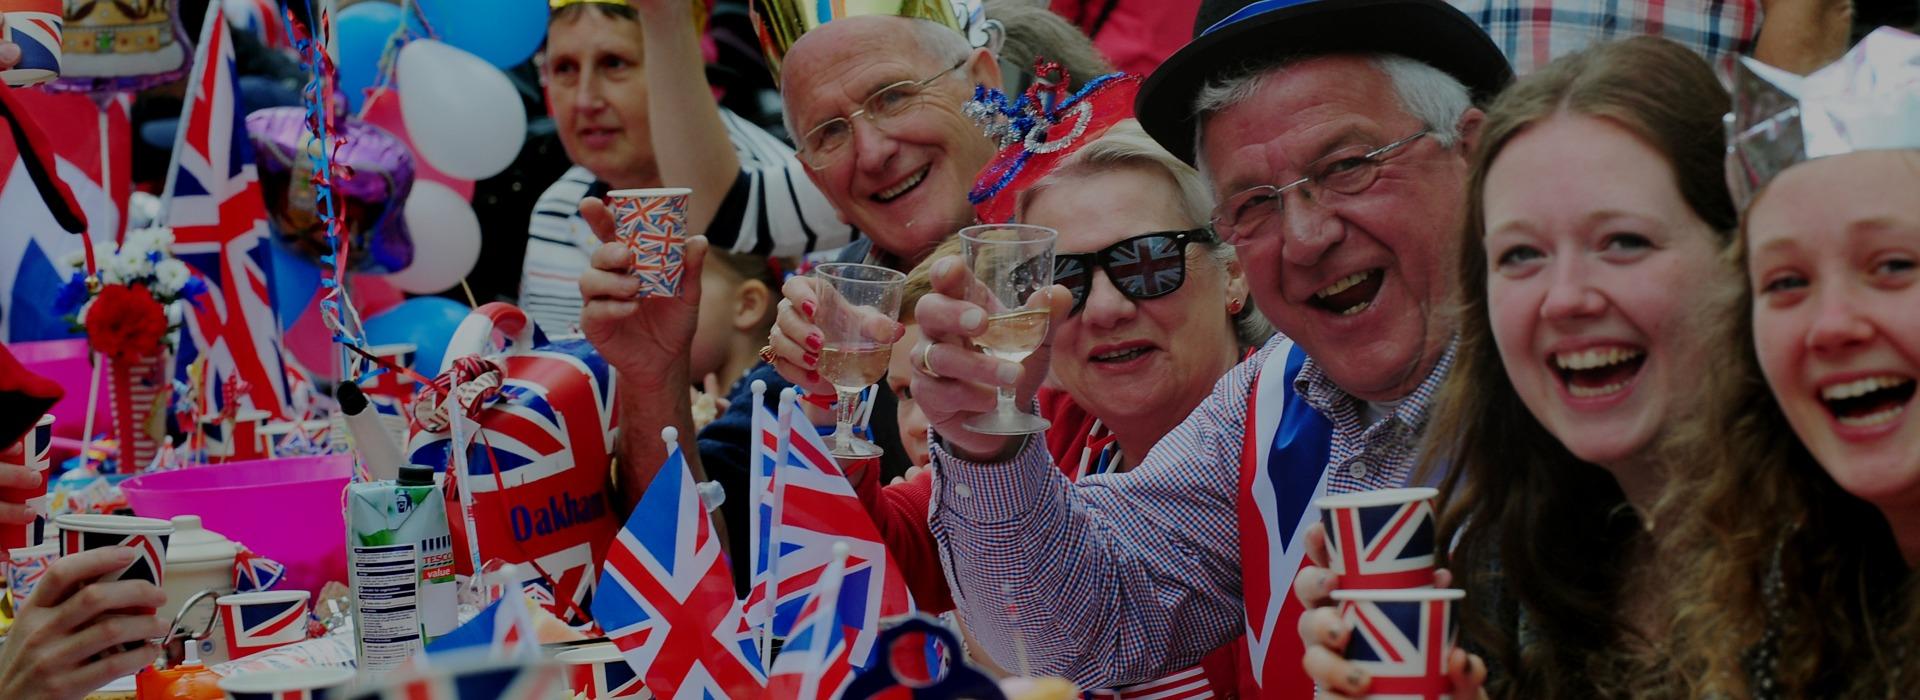 british party